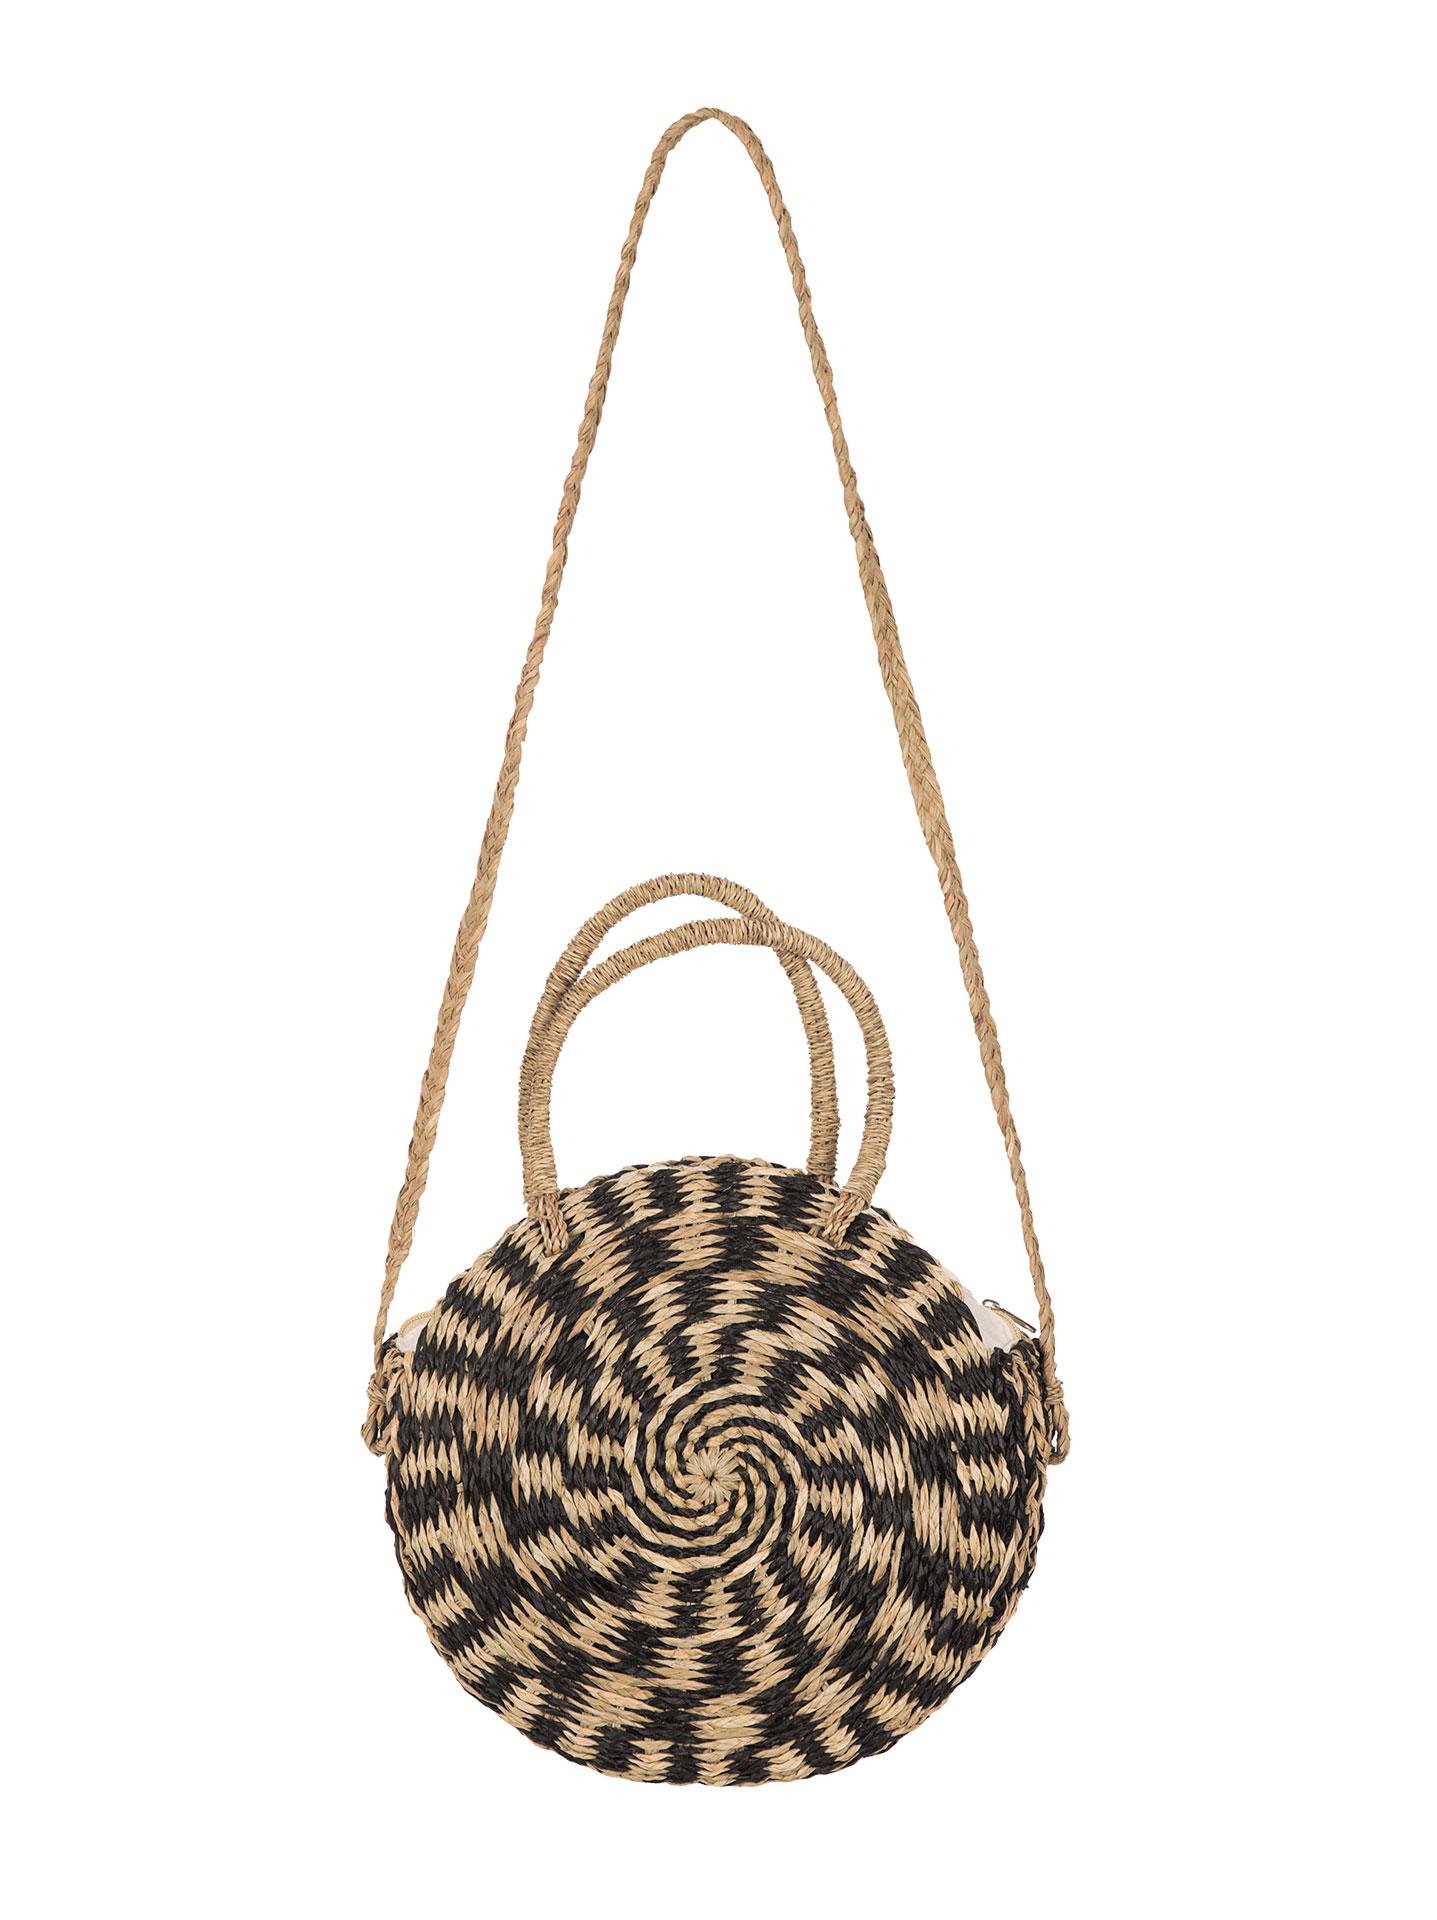 e81093f90a5 Δίχρωμη στρογγυλή ψάθινη τσάντα σε μαυρο, 29,95€   Celestino